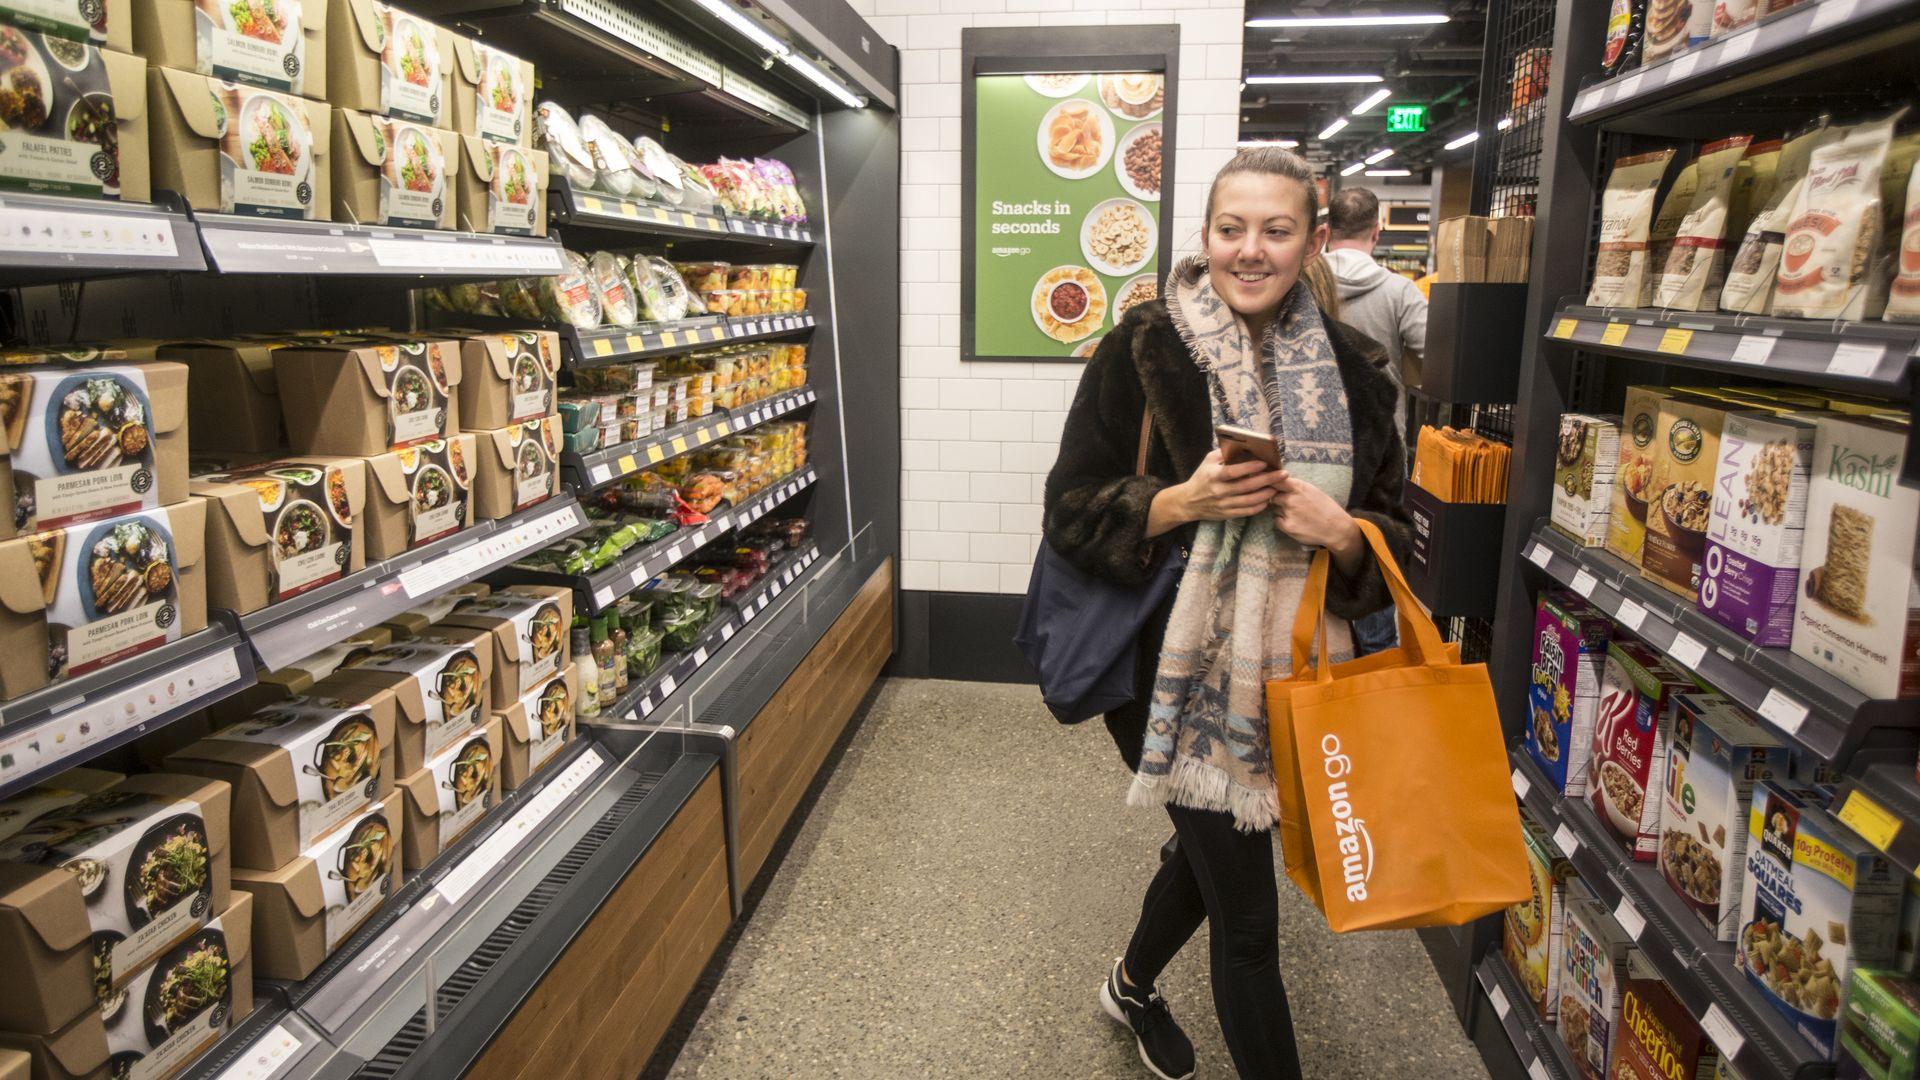 A women walks by a refrigerator case holding an orange Amazon Go bag